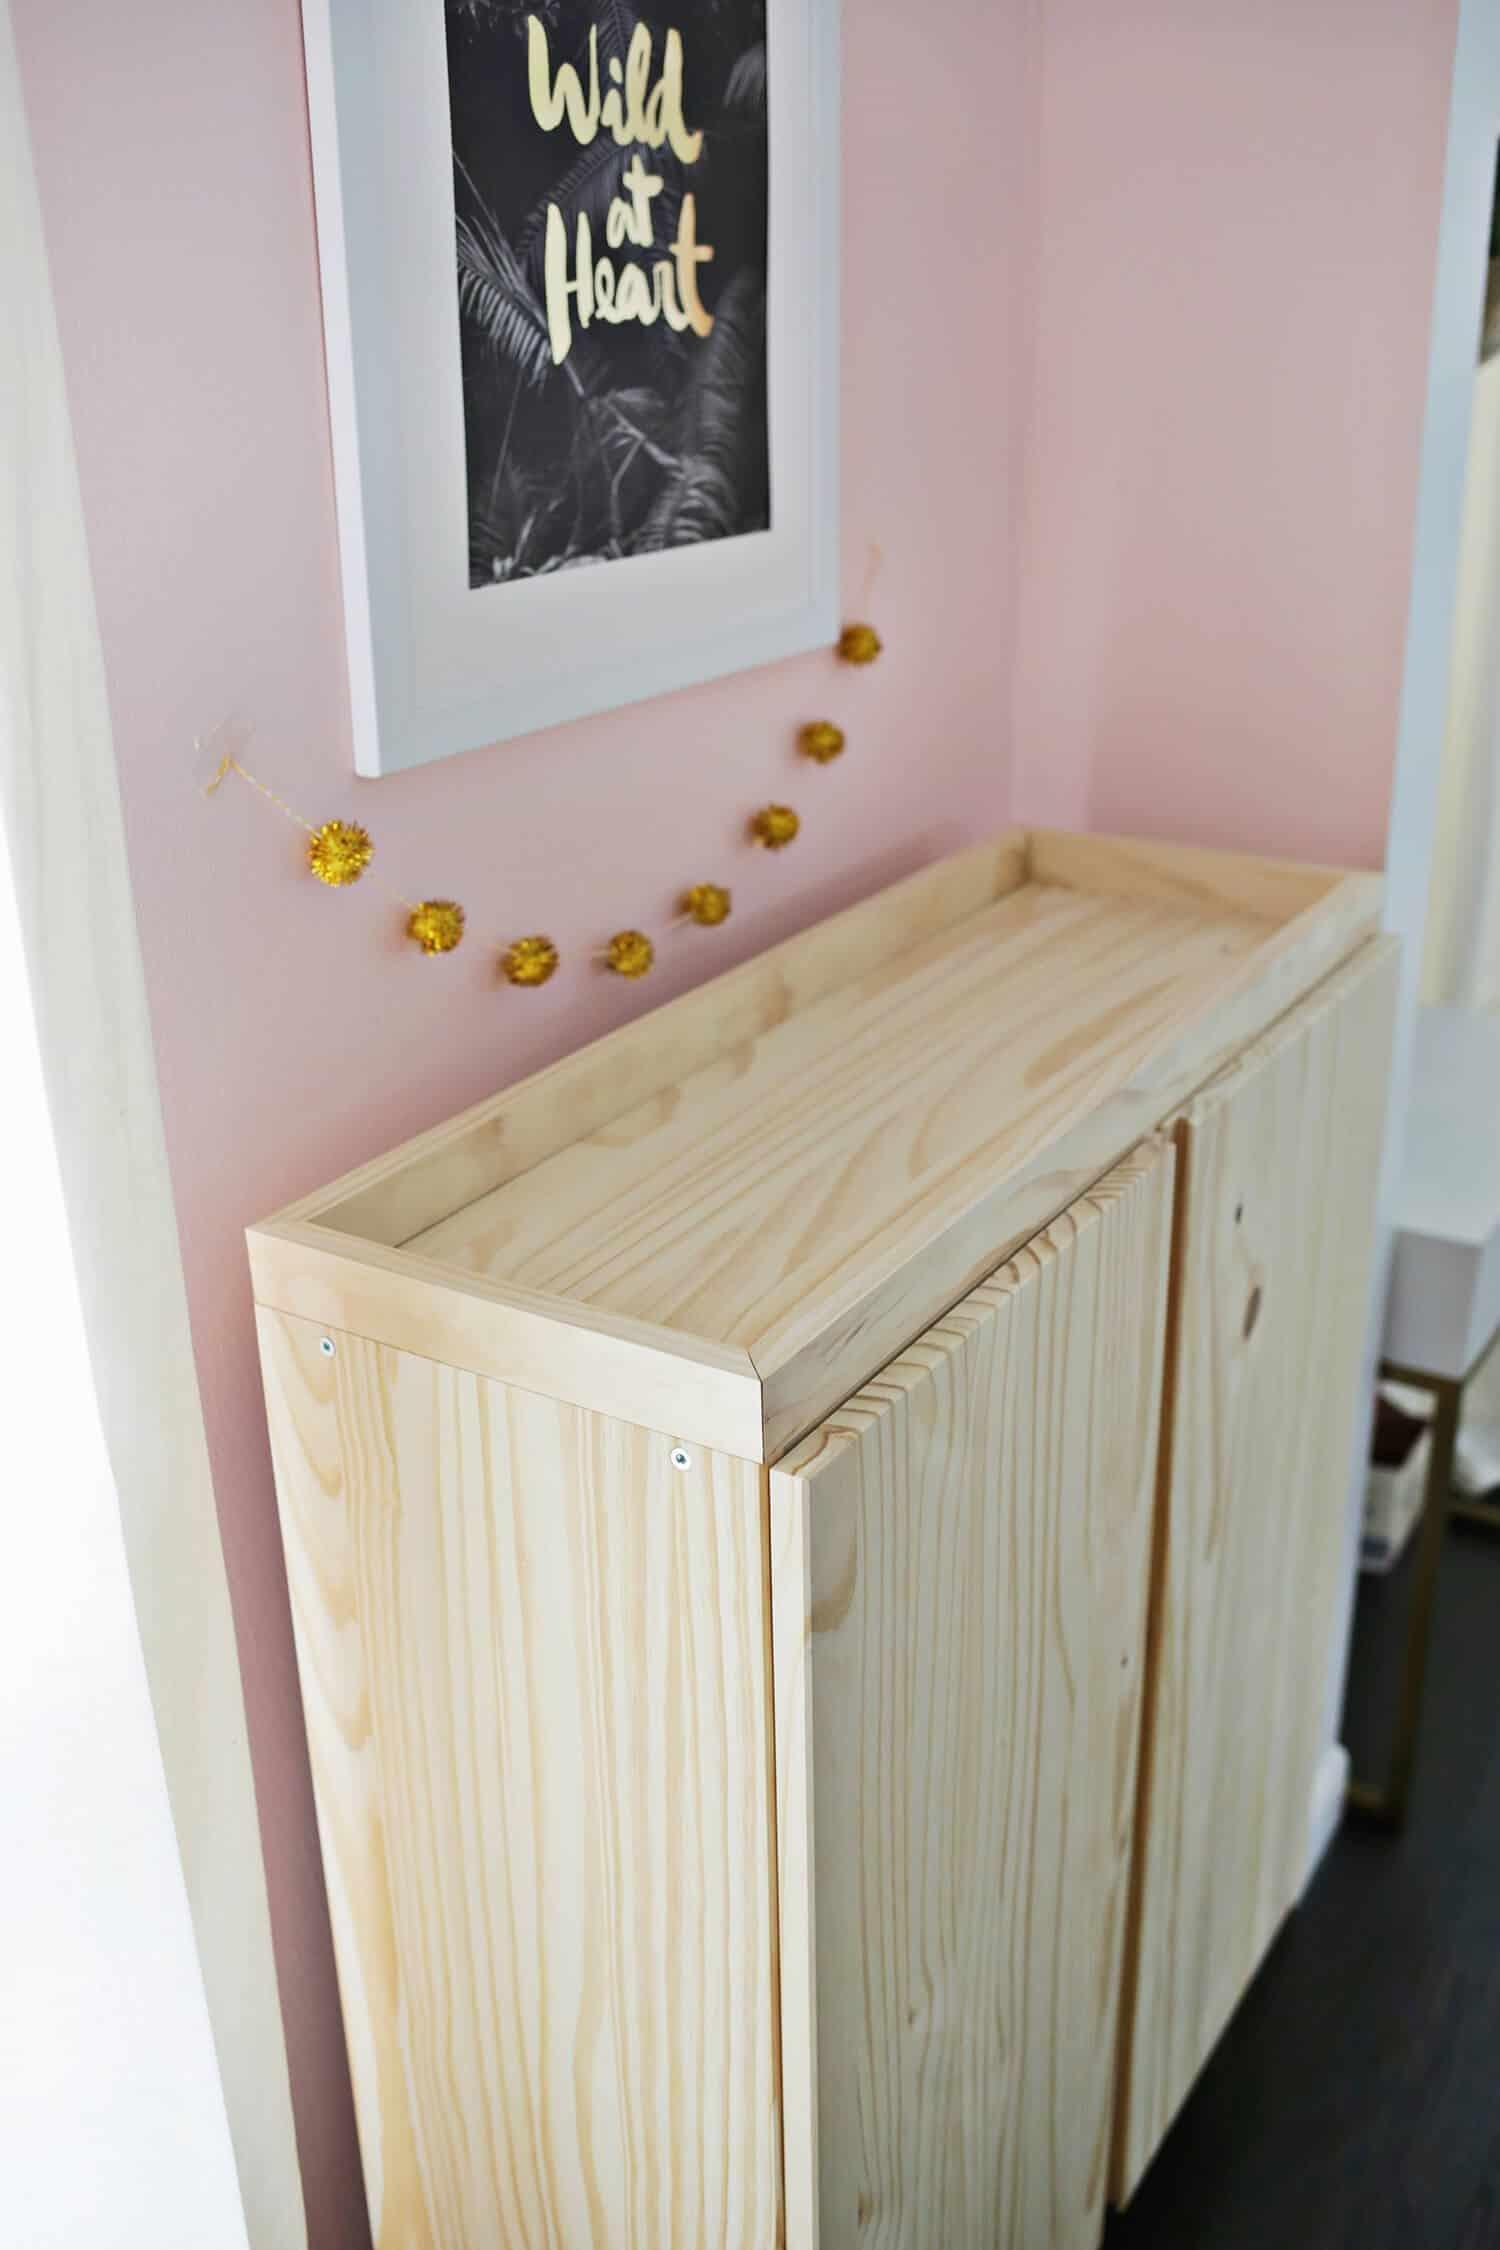 Ikea IVAR Cabinet Hack (Turned Into A Bar Cabinet!) - A ...